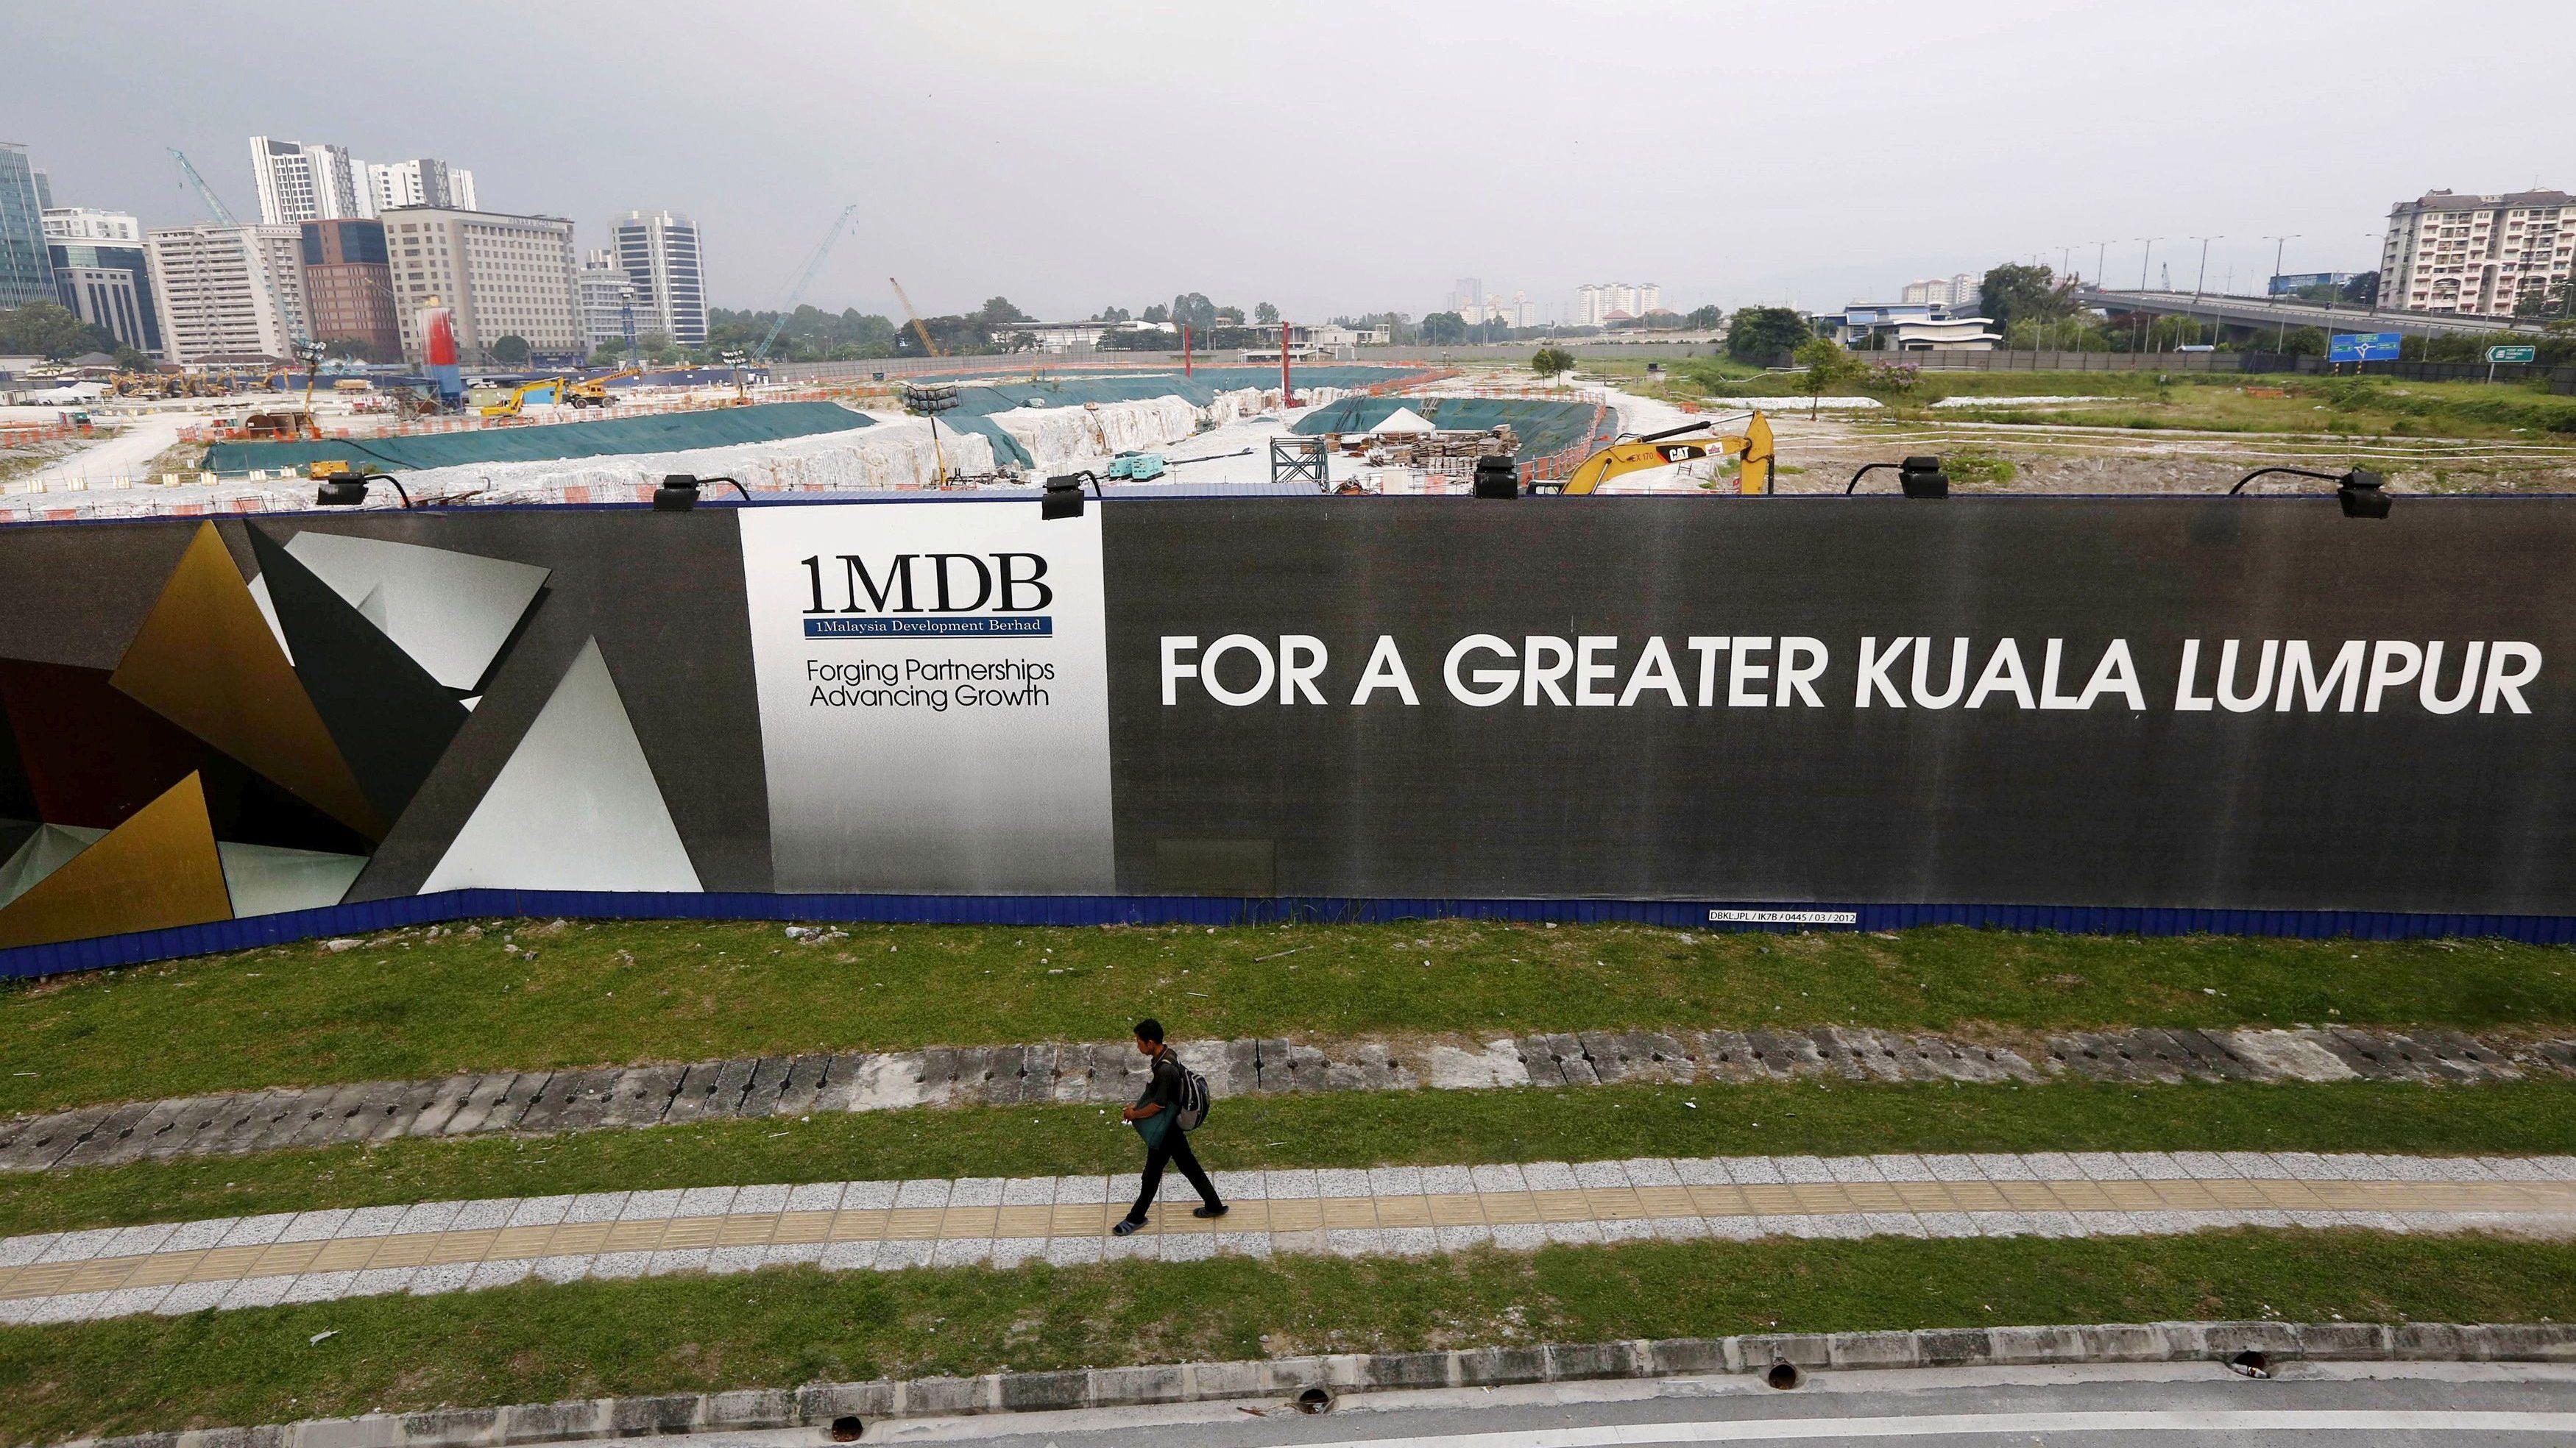 A man walks past a 1 Malaysia Development Berhad (1MDB) billboard at the funds flagship Tun Razak Exchange development in Kuala Lumpur